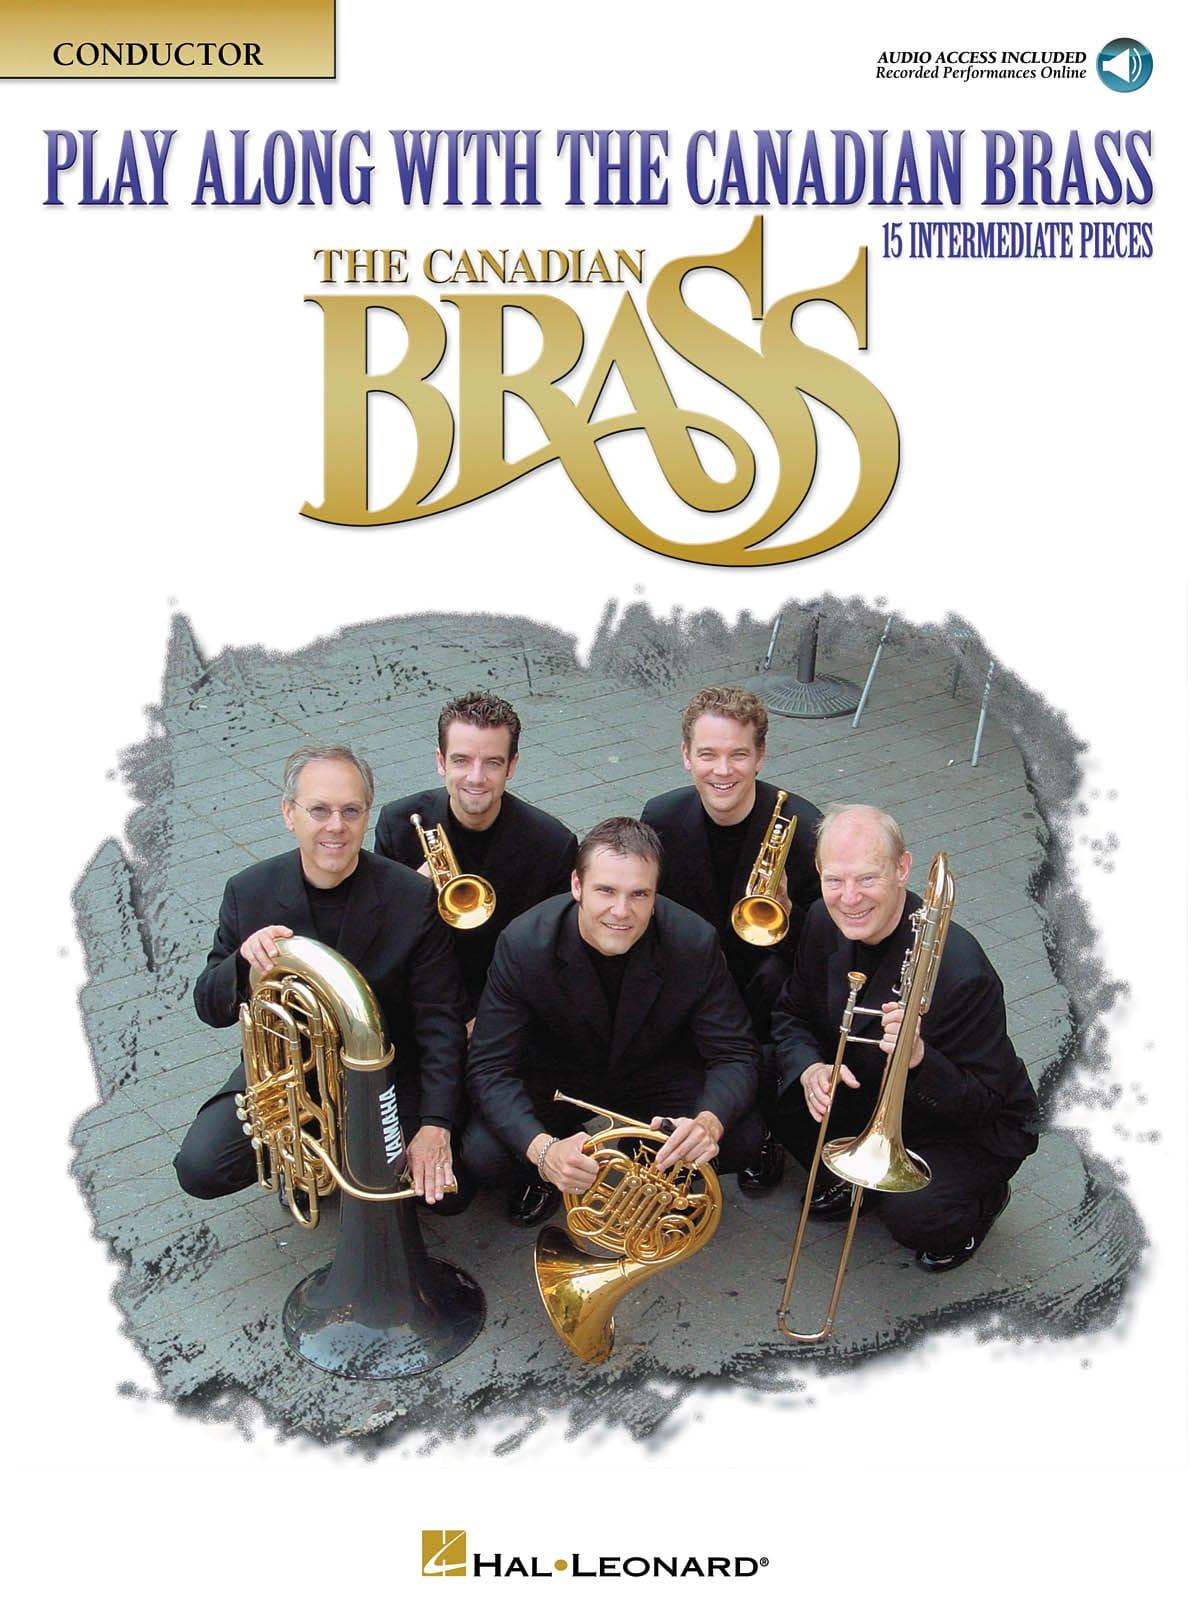 Play Along With the Canadian Brass - 15 intermediate Pieces avec audio - laflutedepan.com